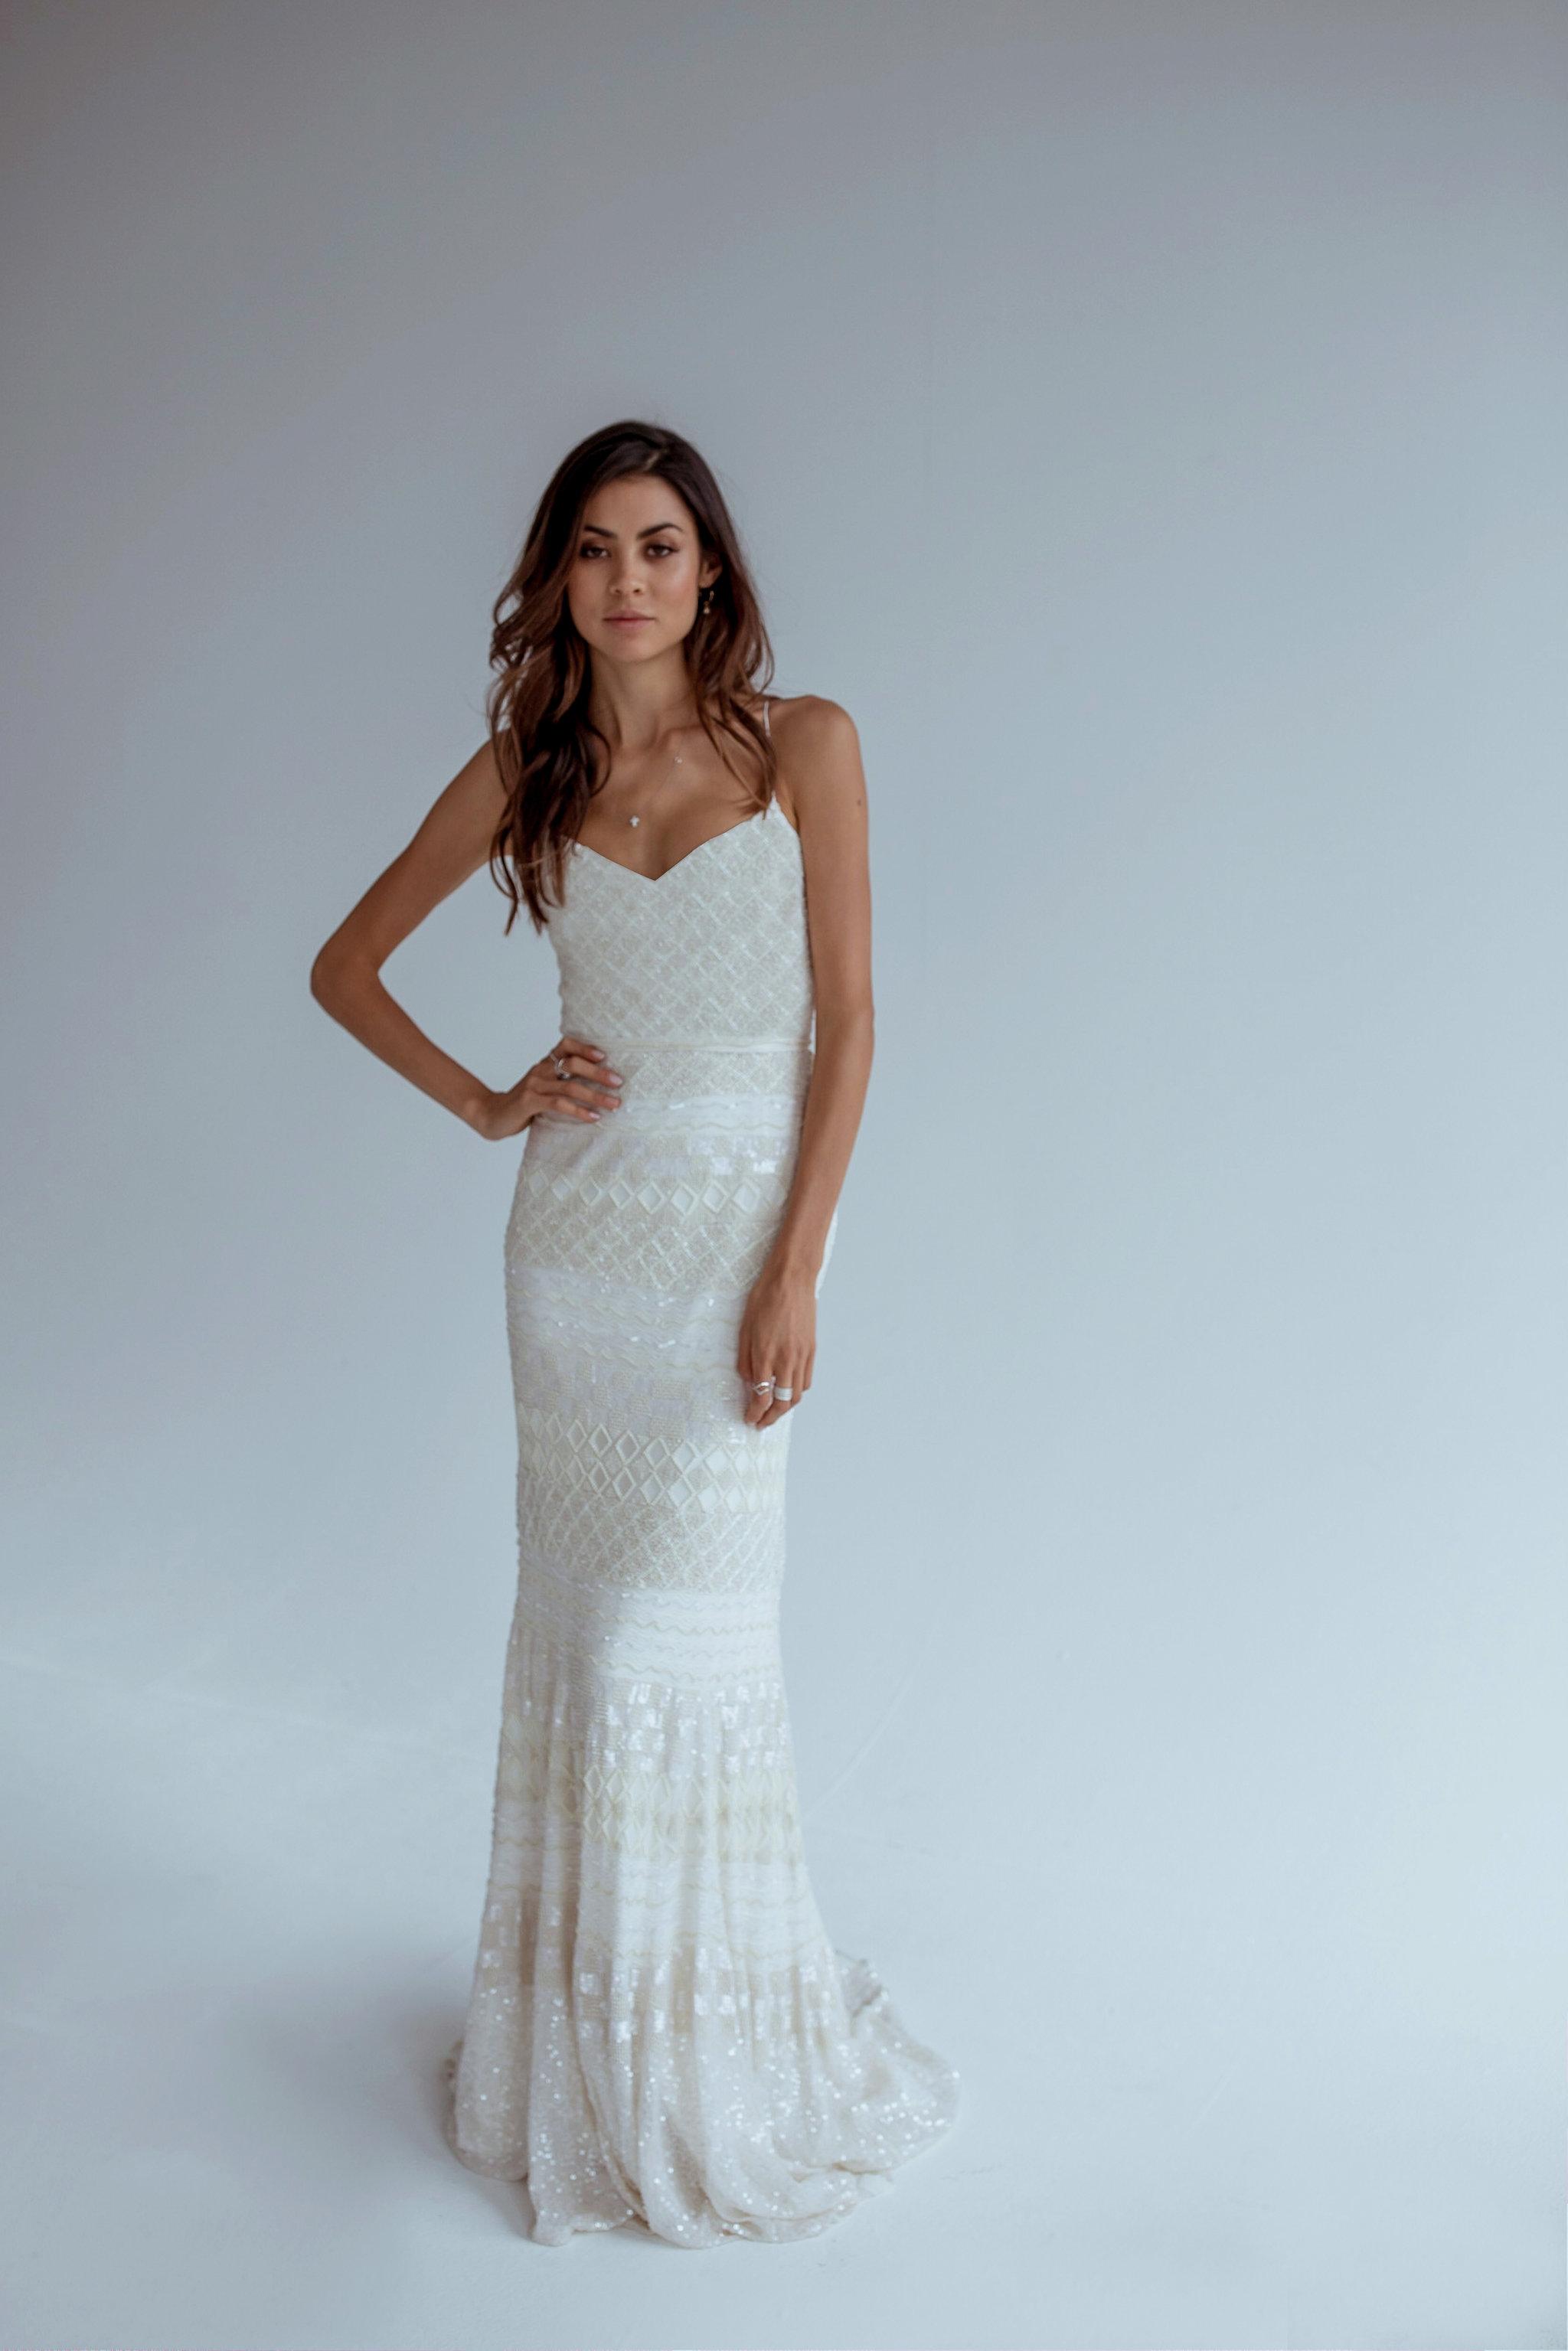 Dorable Vestido De Novia De Columbus Ohio Componente - Ideas de ...